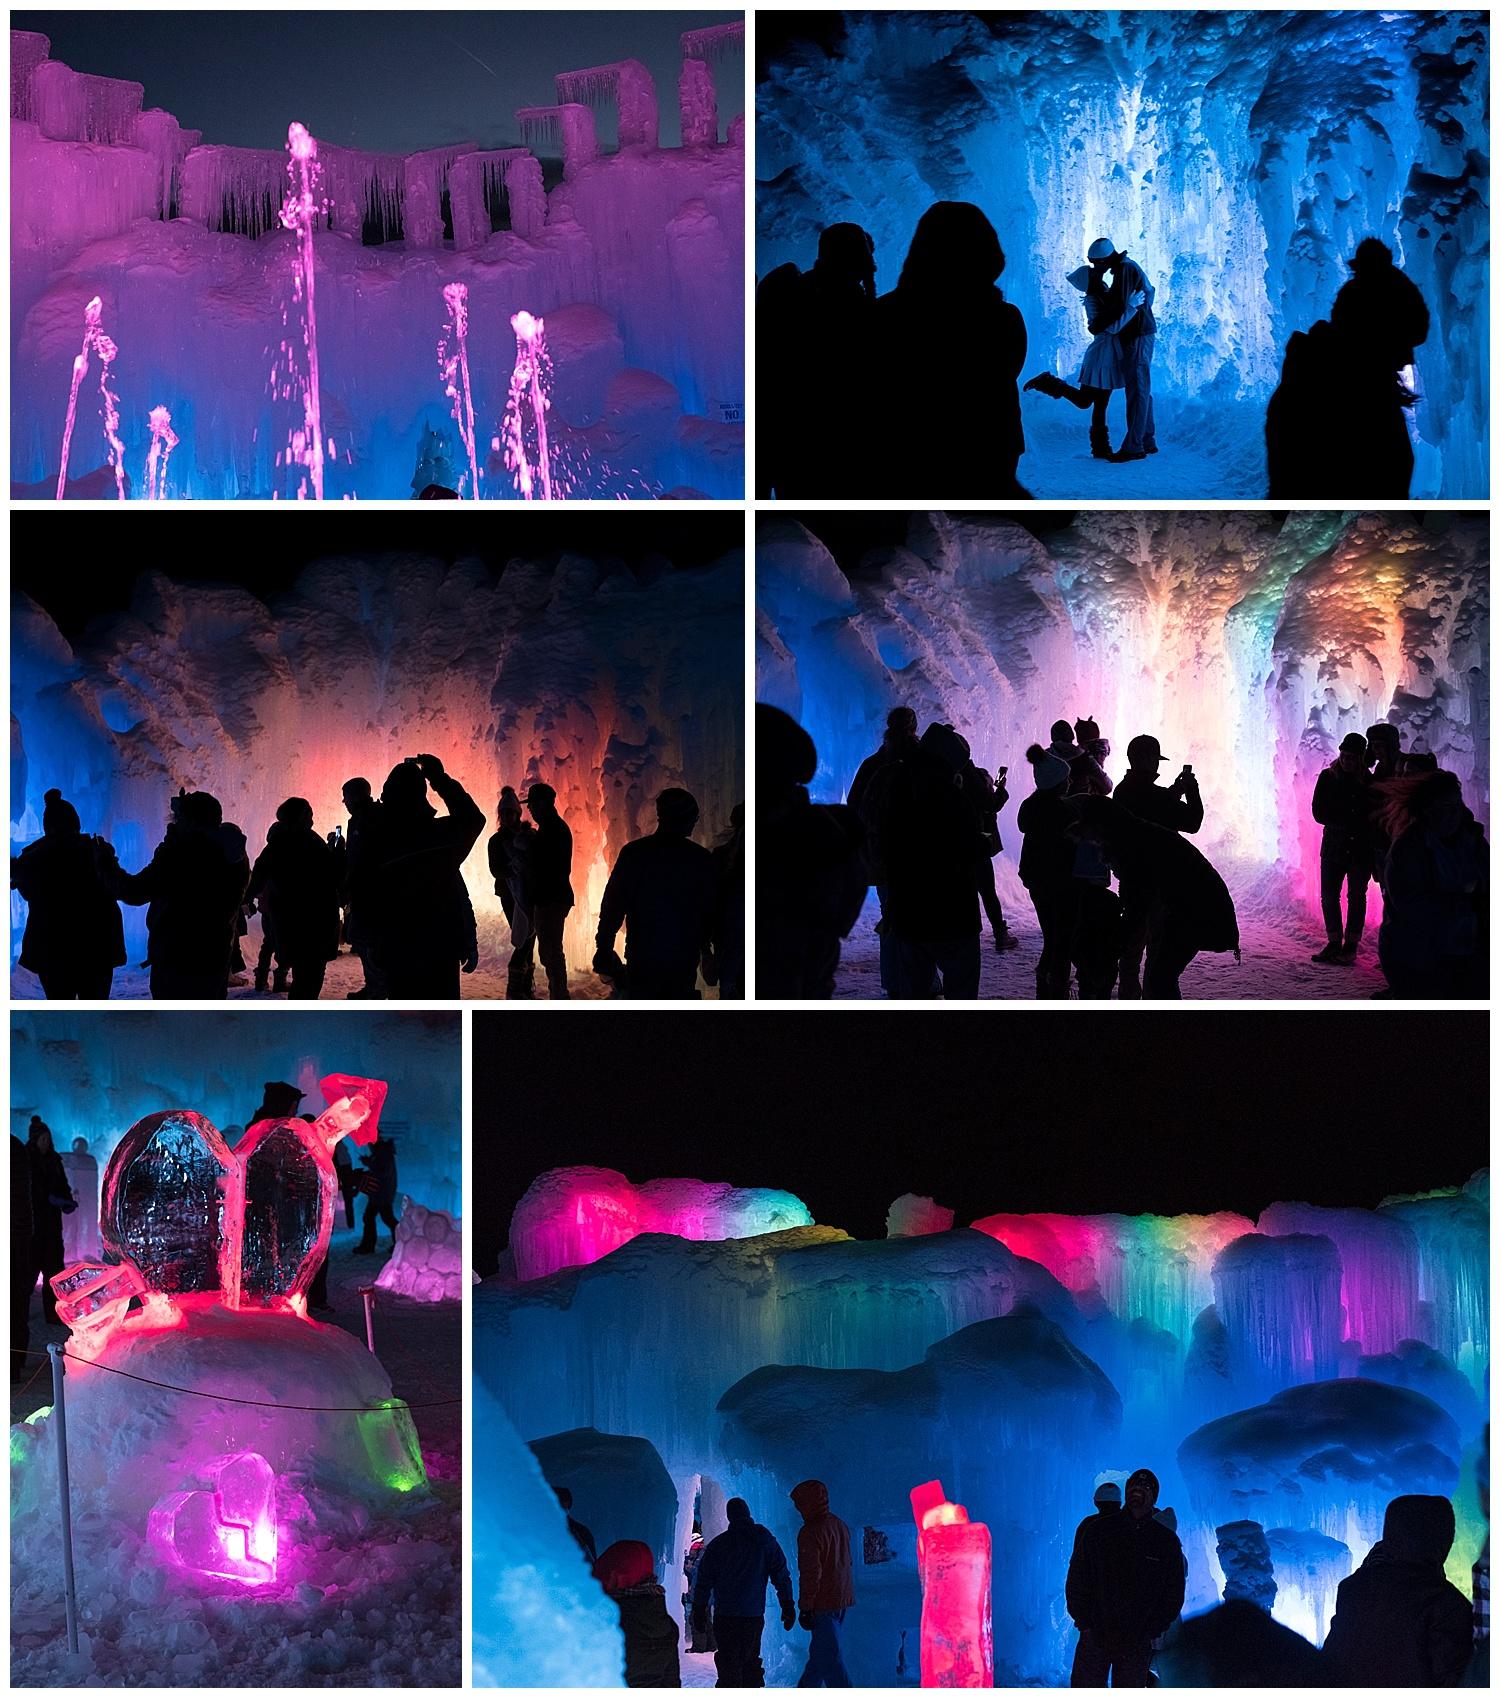 Andrea-Burolla-Photography-Denver-Childrens-Photographer-Icecastles-Nighttime-Rainbow-ice-sculpture.jpg